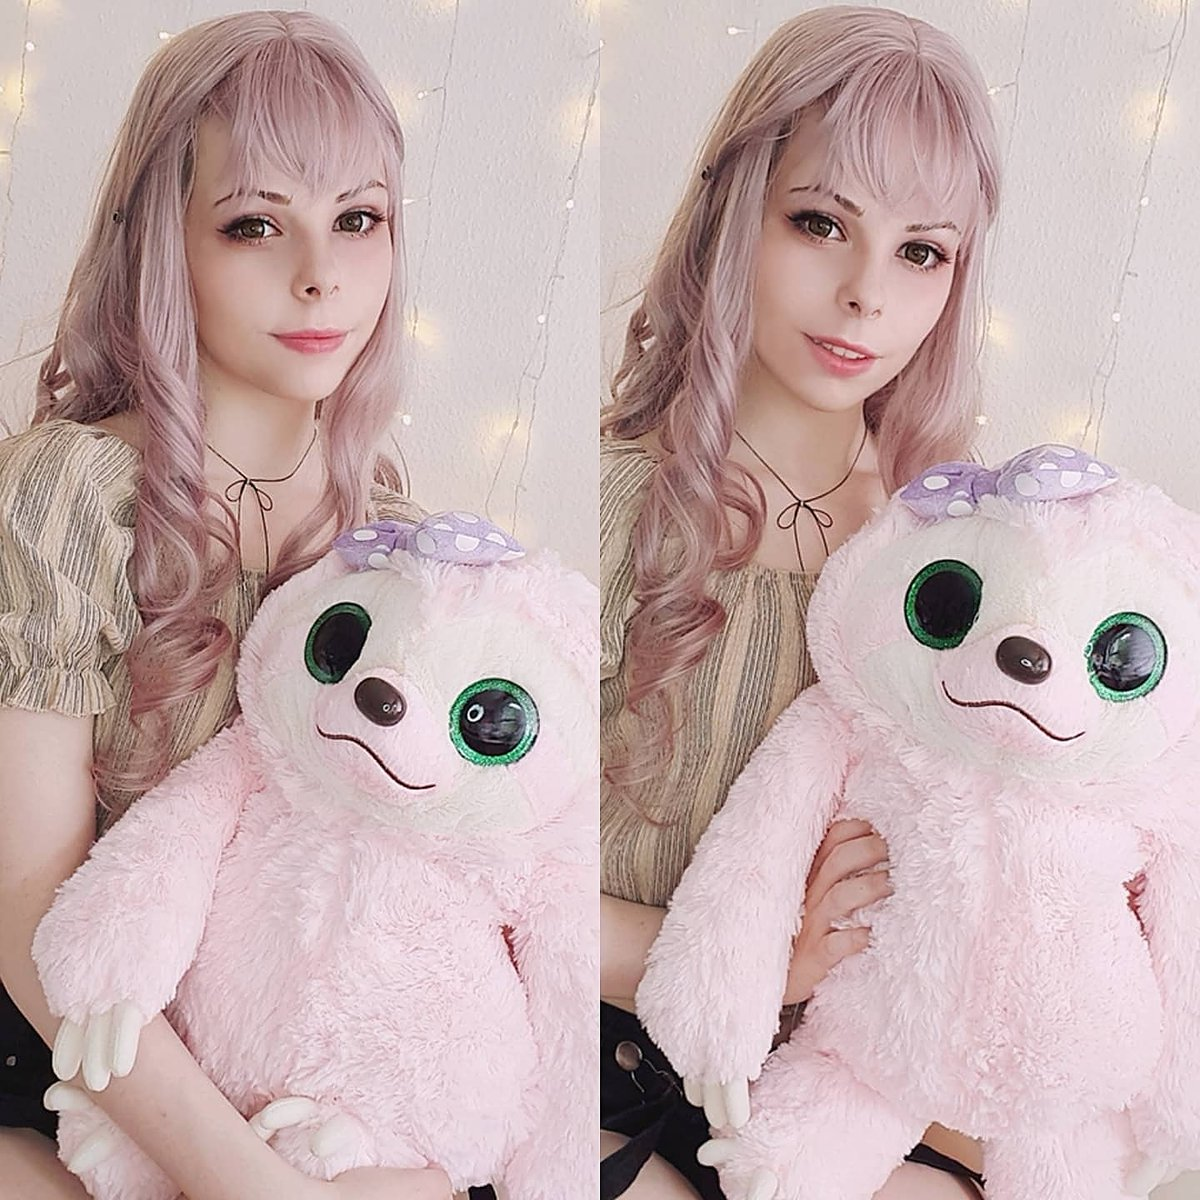 "Use my discount code ""Thanatos"" for 10% off your order from http://manga-mafia.com Insta: thanatos_arts_official #kawaiimakeup #koreanfashion #japanesefashion #giveaway #mangamafia #cutecosplay #cosplaymakeup #cosplaywig #pastelmaleup #kpopgirl #otaku #germanotaku #animegirlpic.twitter.com/Qs4sHbe1h0"